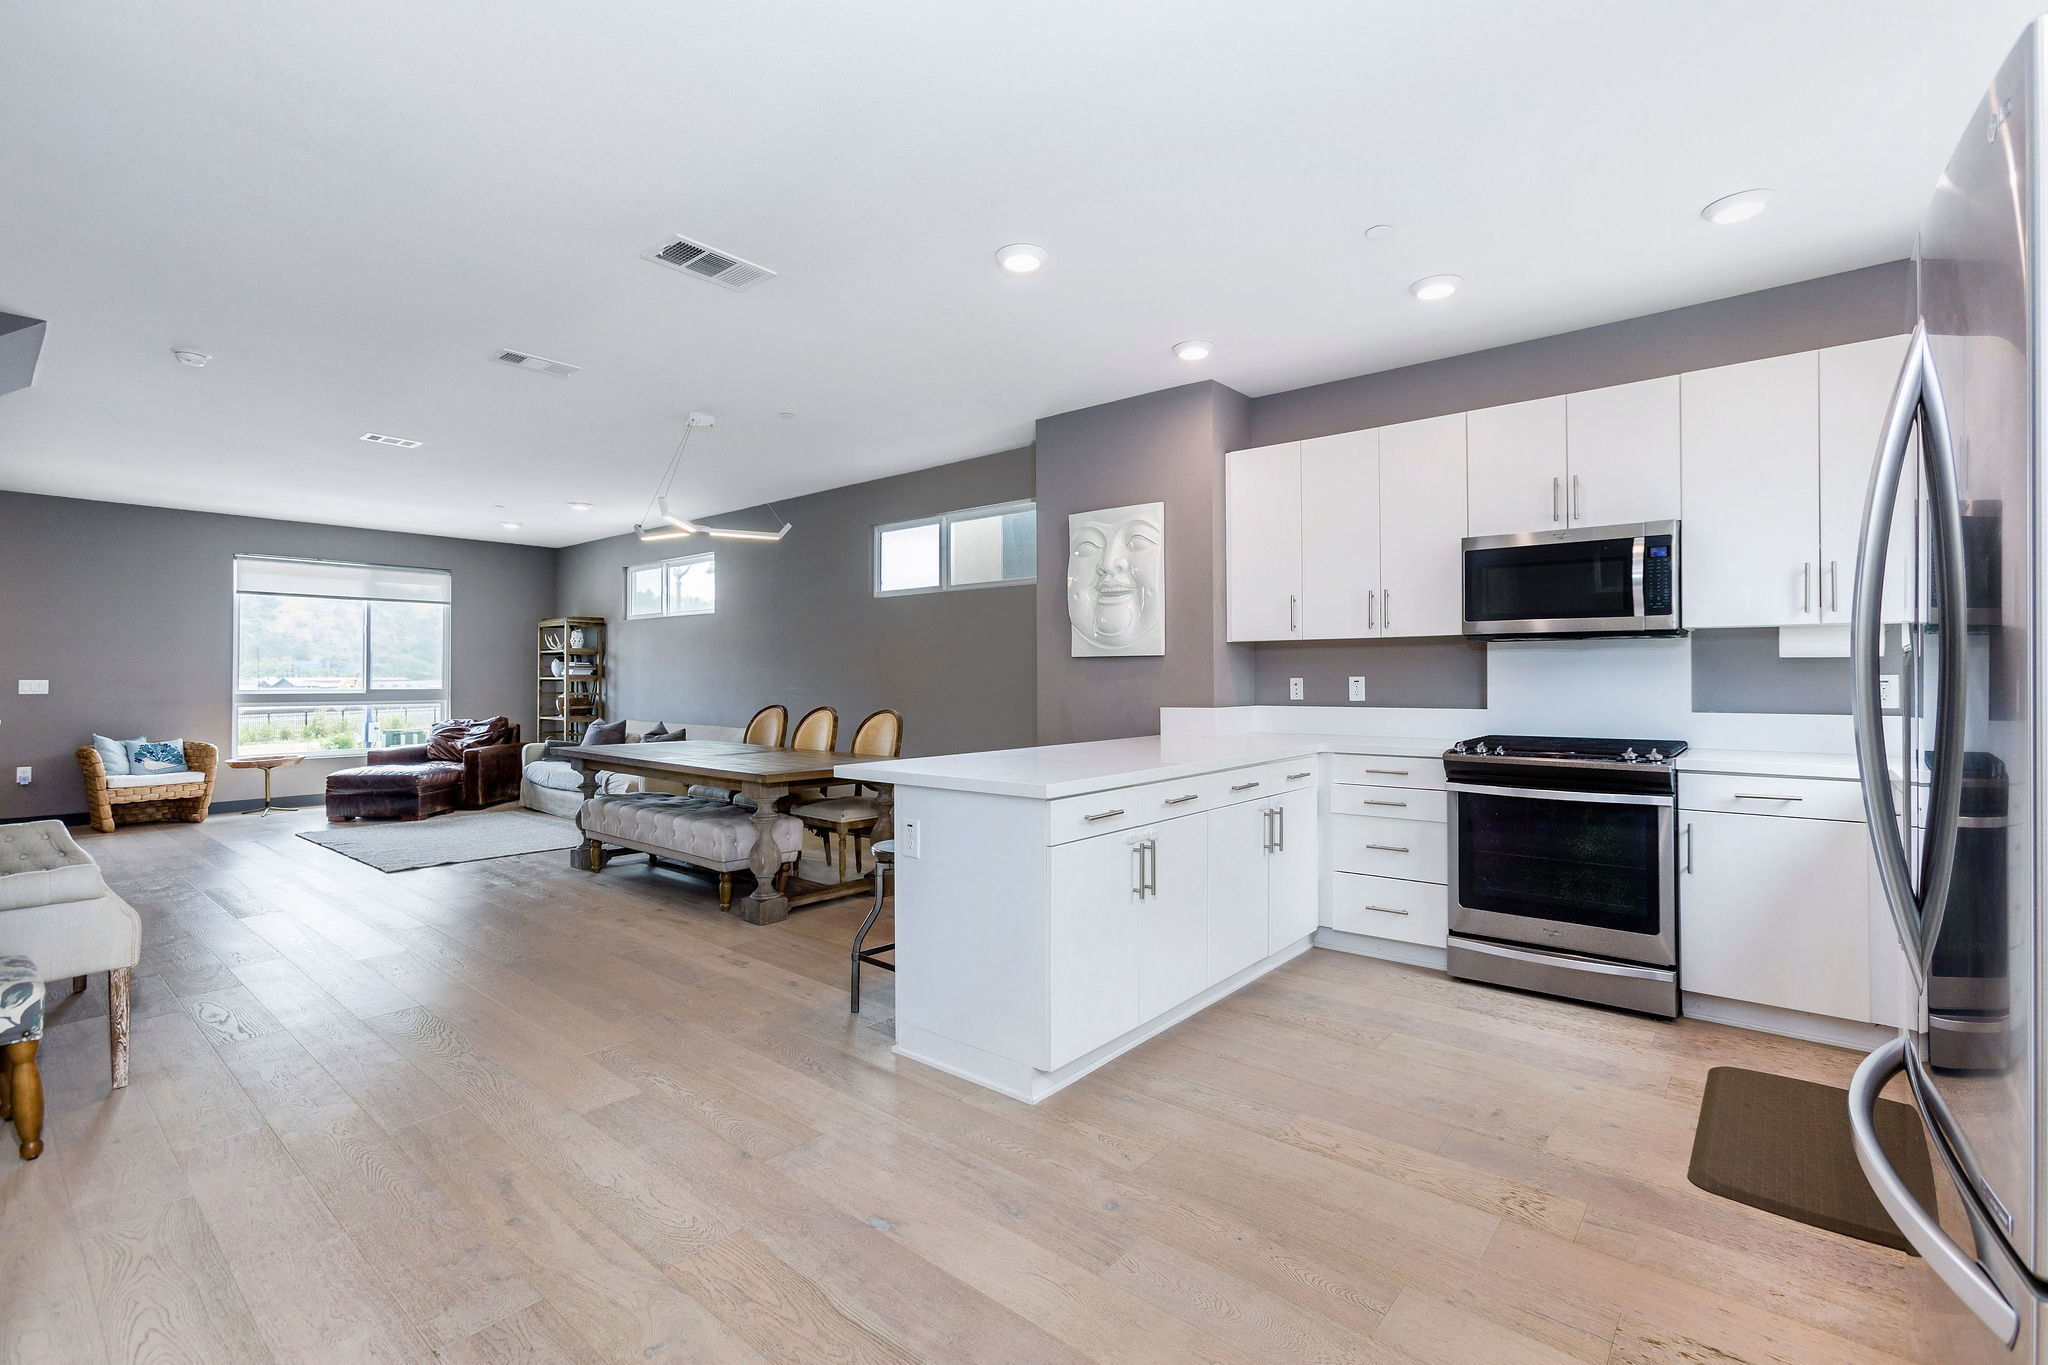 $799,000 4-Bedroom Newer Home | Hot Neighborhood of Cypress Park image 6